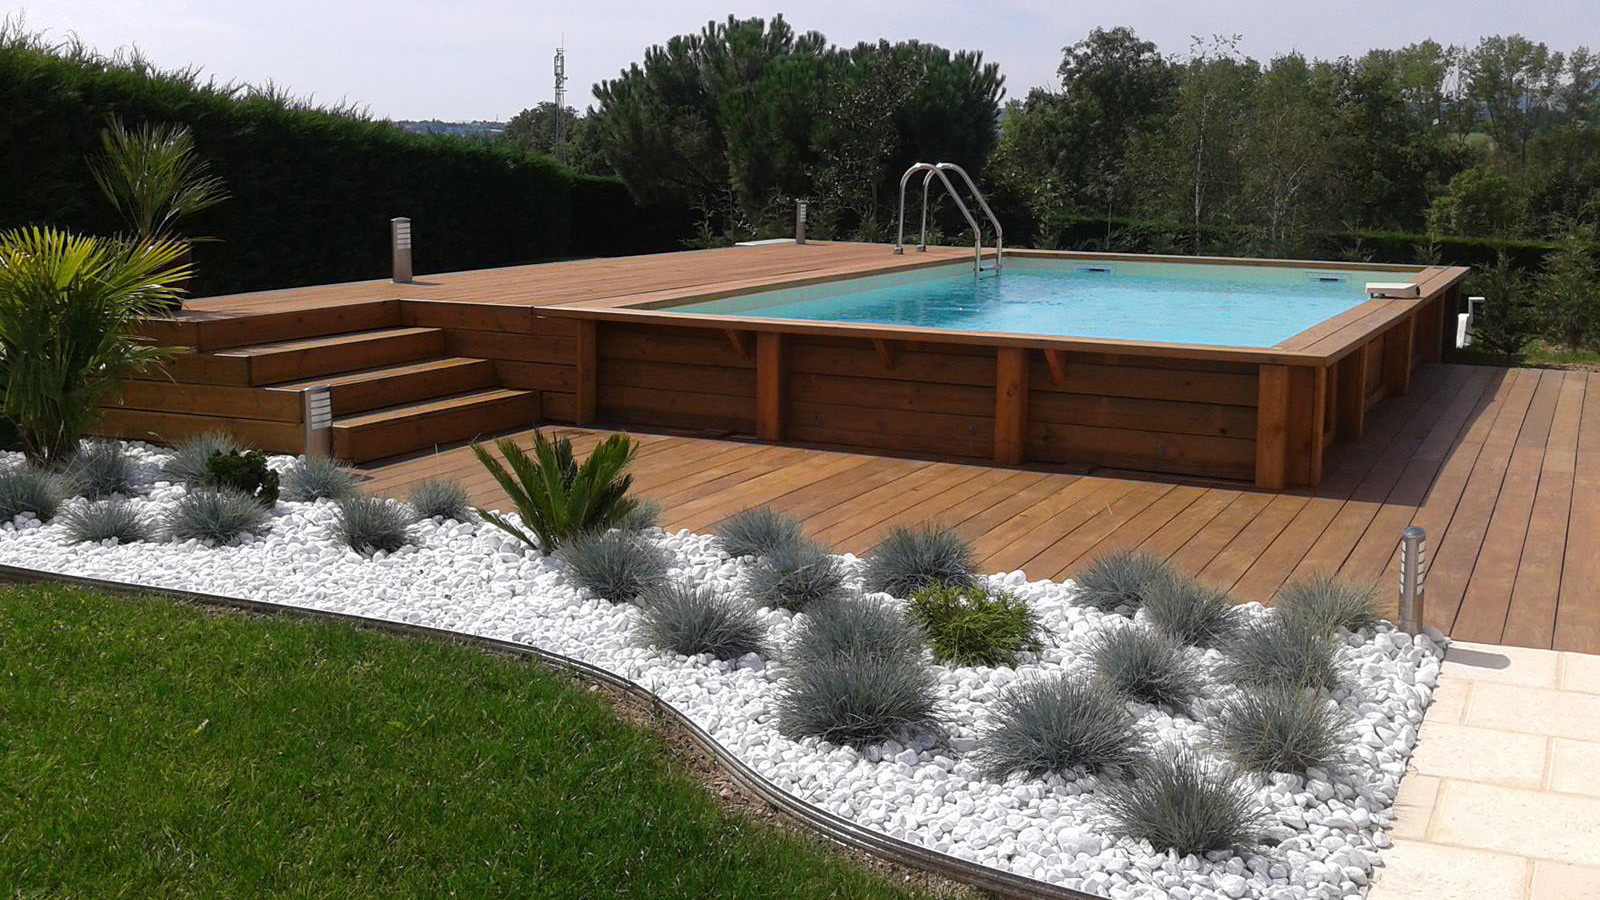 Amenagement piscine en bois hors sol - Choix piscine hors sol ...